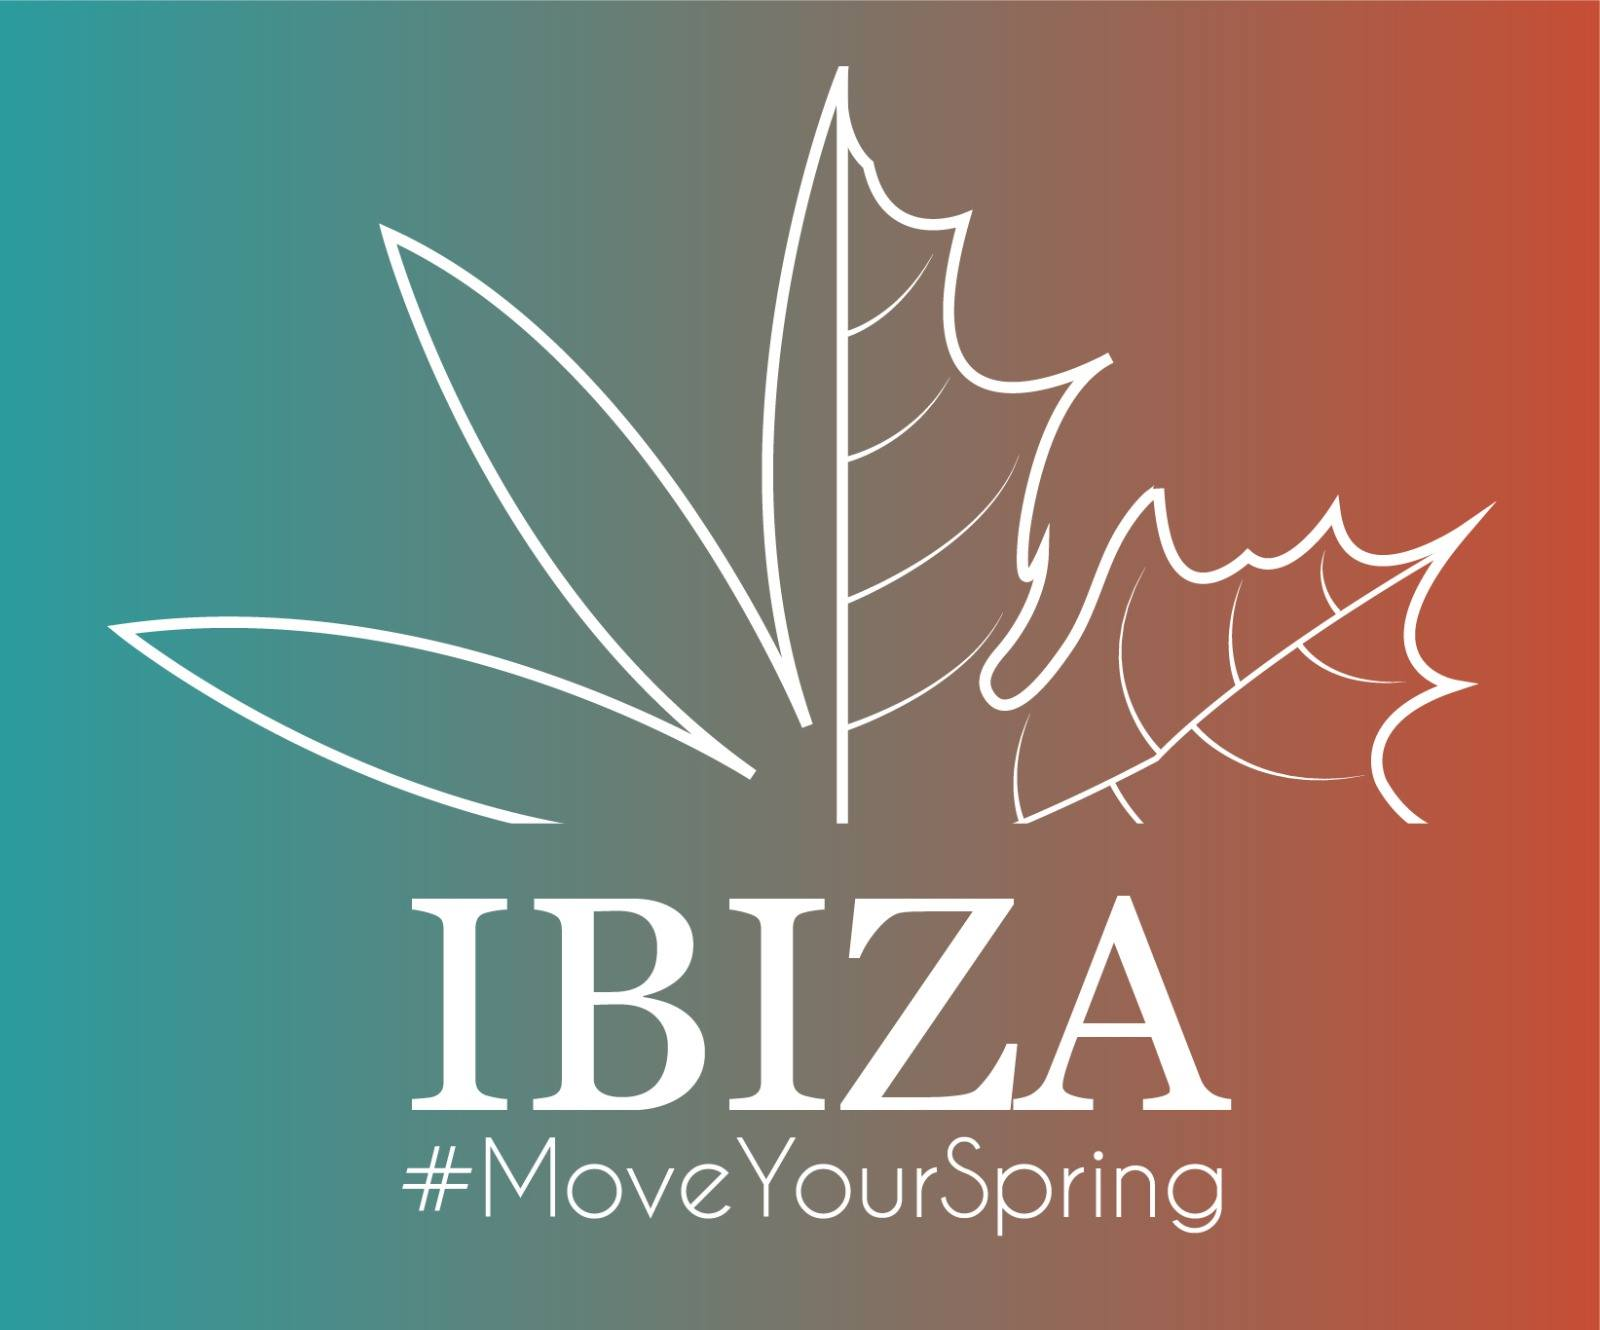 Ibiza #MoveYourSpring